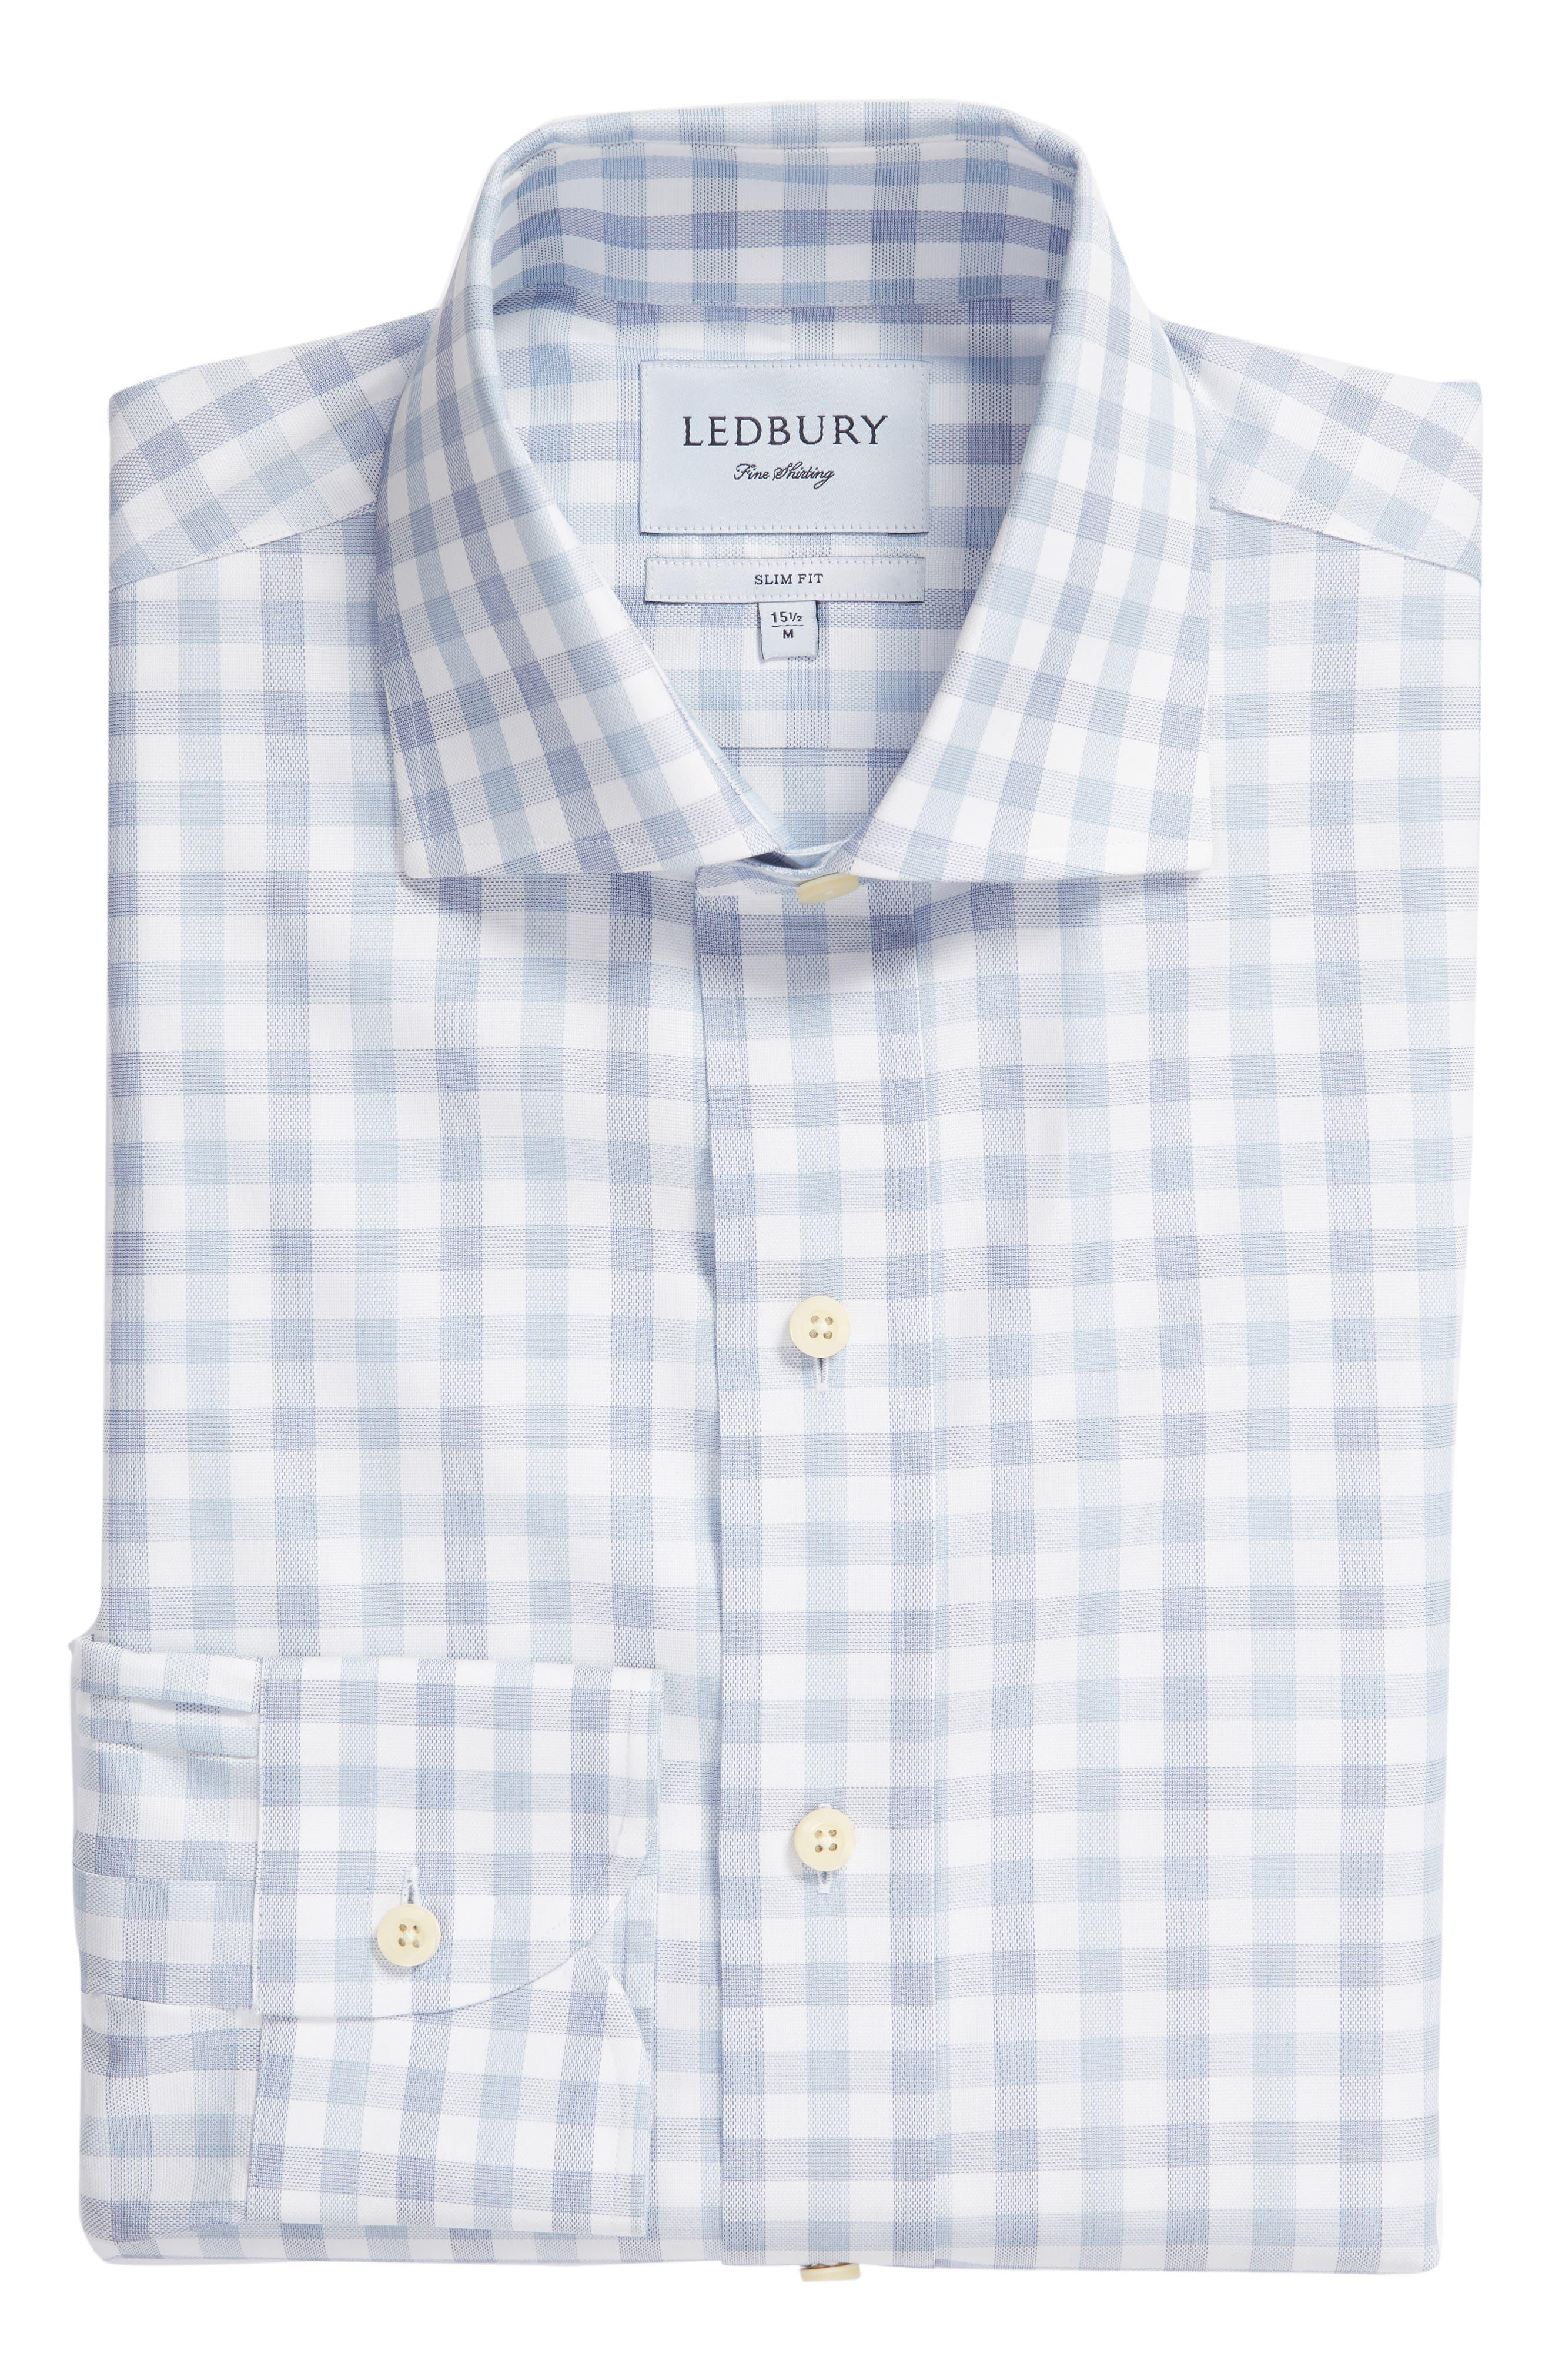 Corbly Trim Fit Check Dress Shirt,                             Alternate thumbnail 5, color,                             LIGHT BLUE